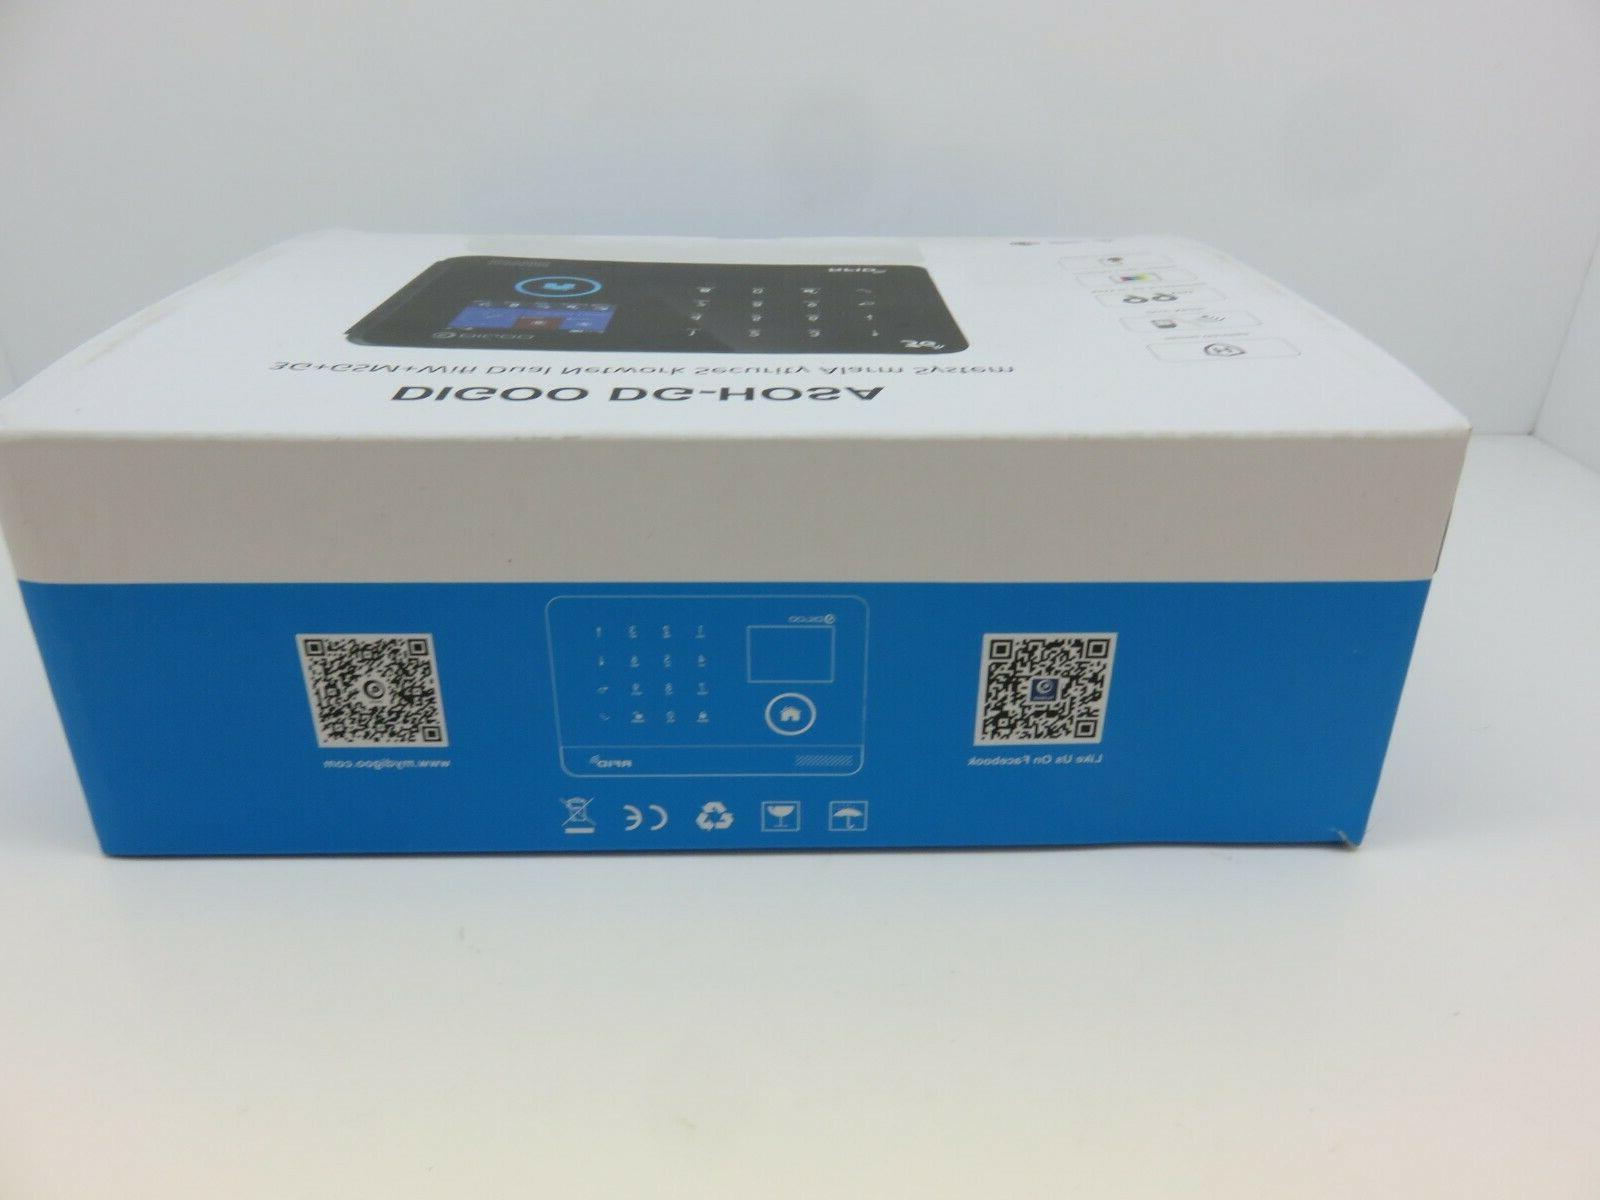 Digoo 3G&GSM&WIFI Home Alarm System